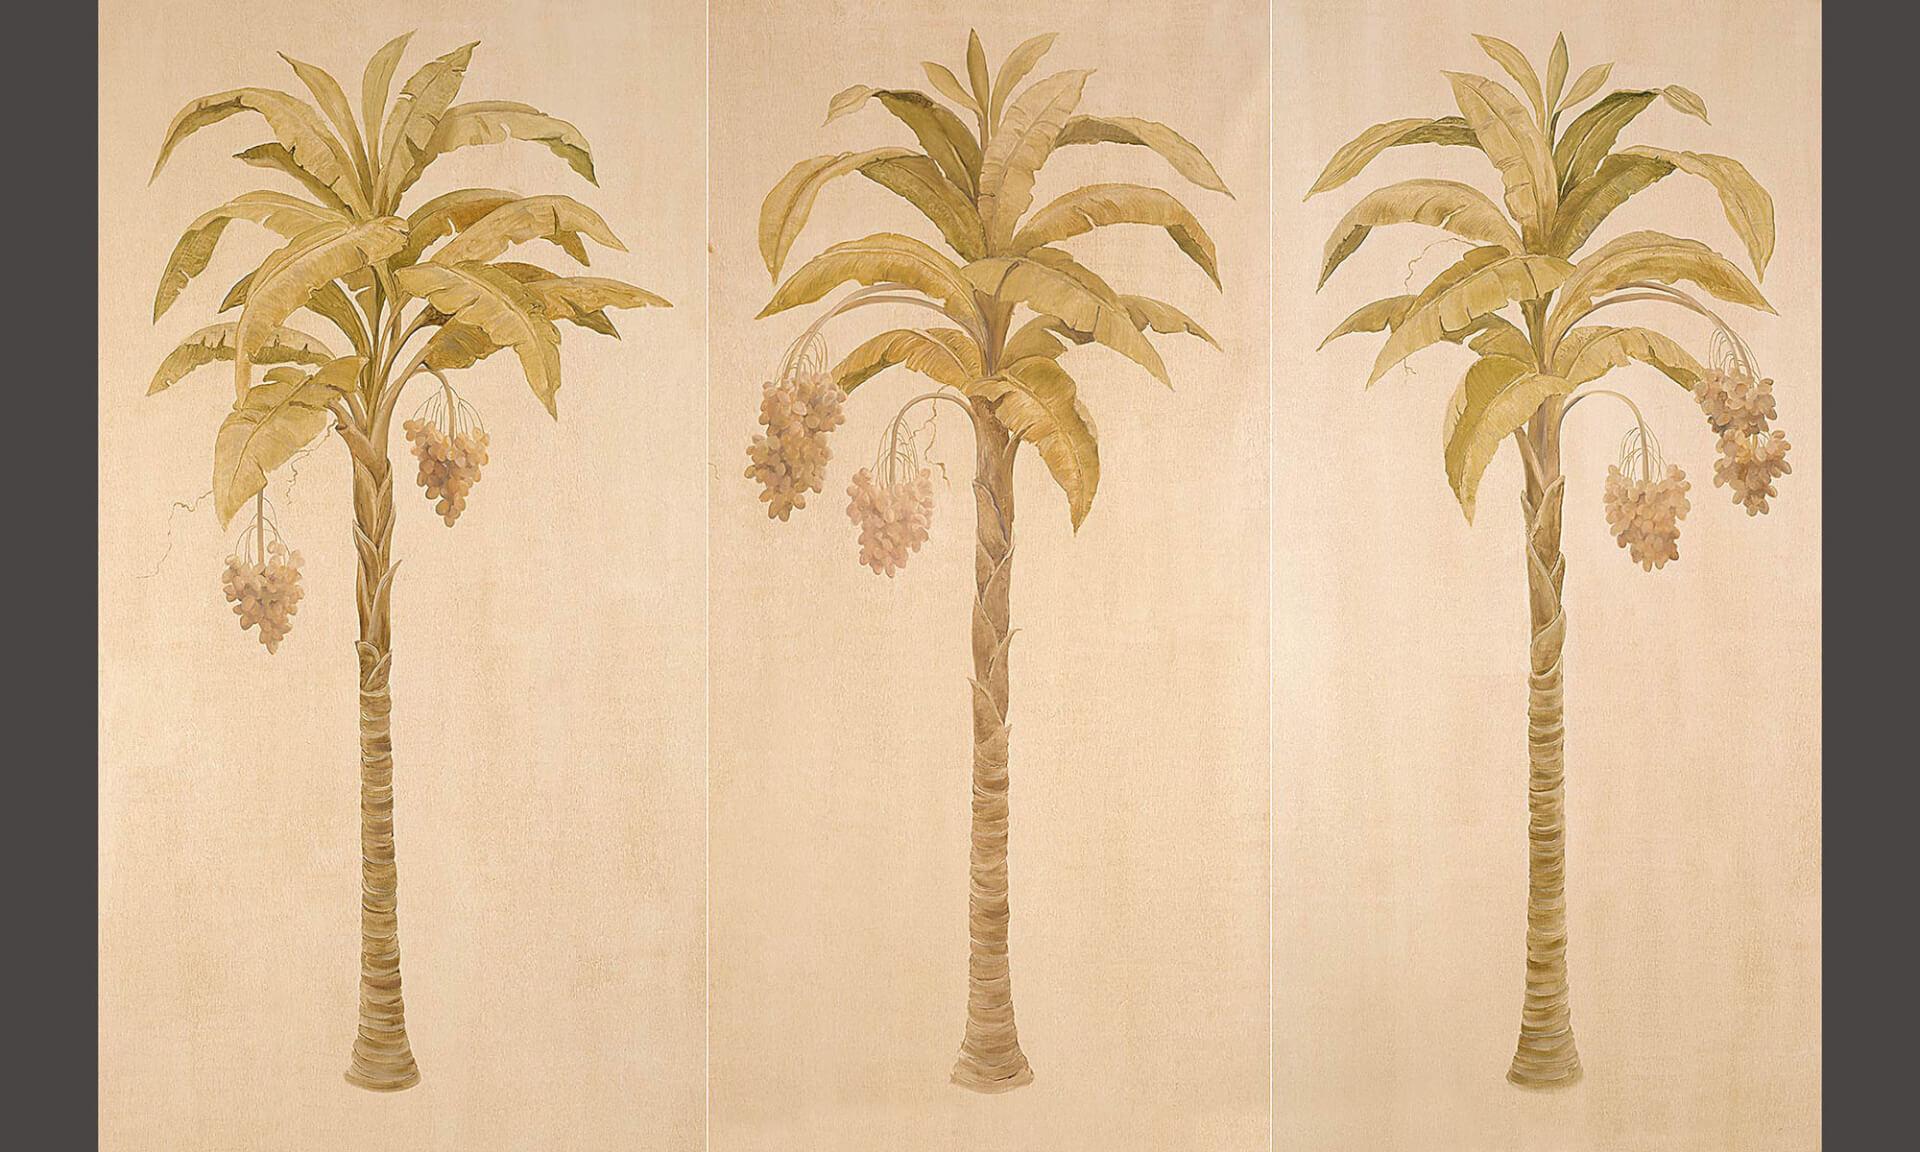 Date Palm 001 Lena Fransioli Mural